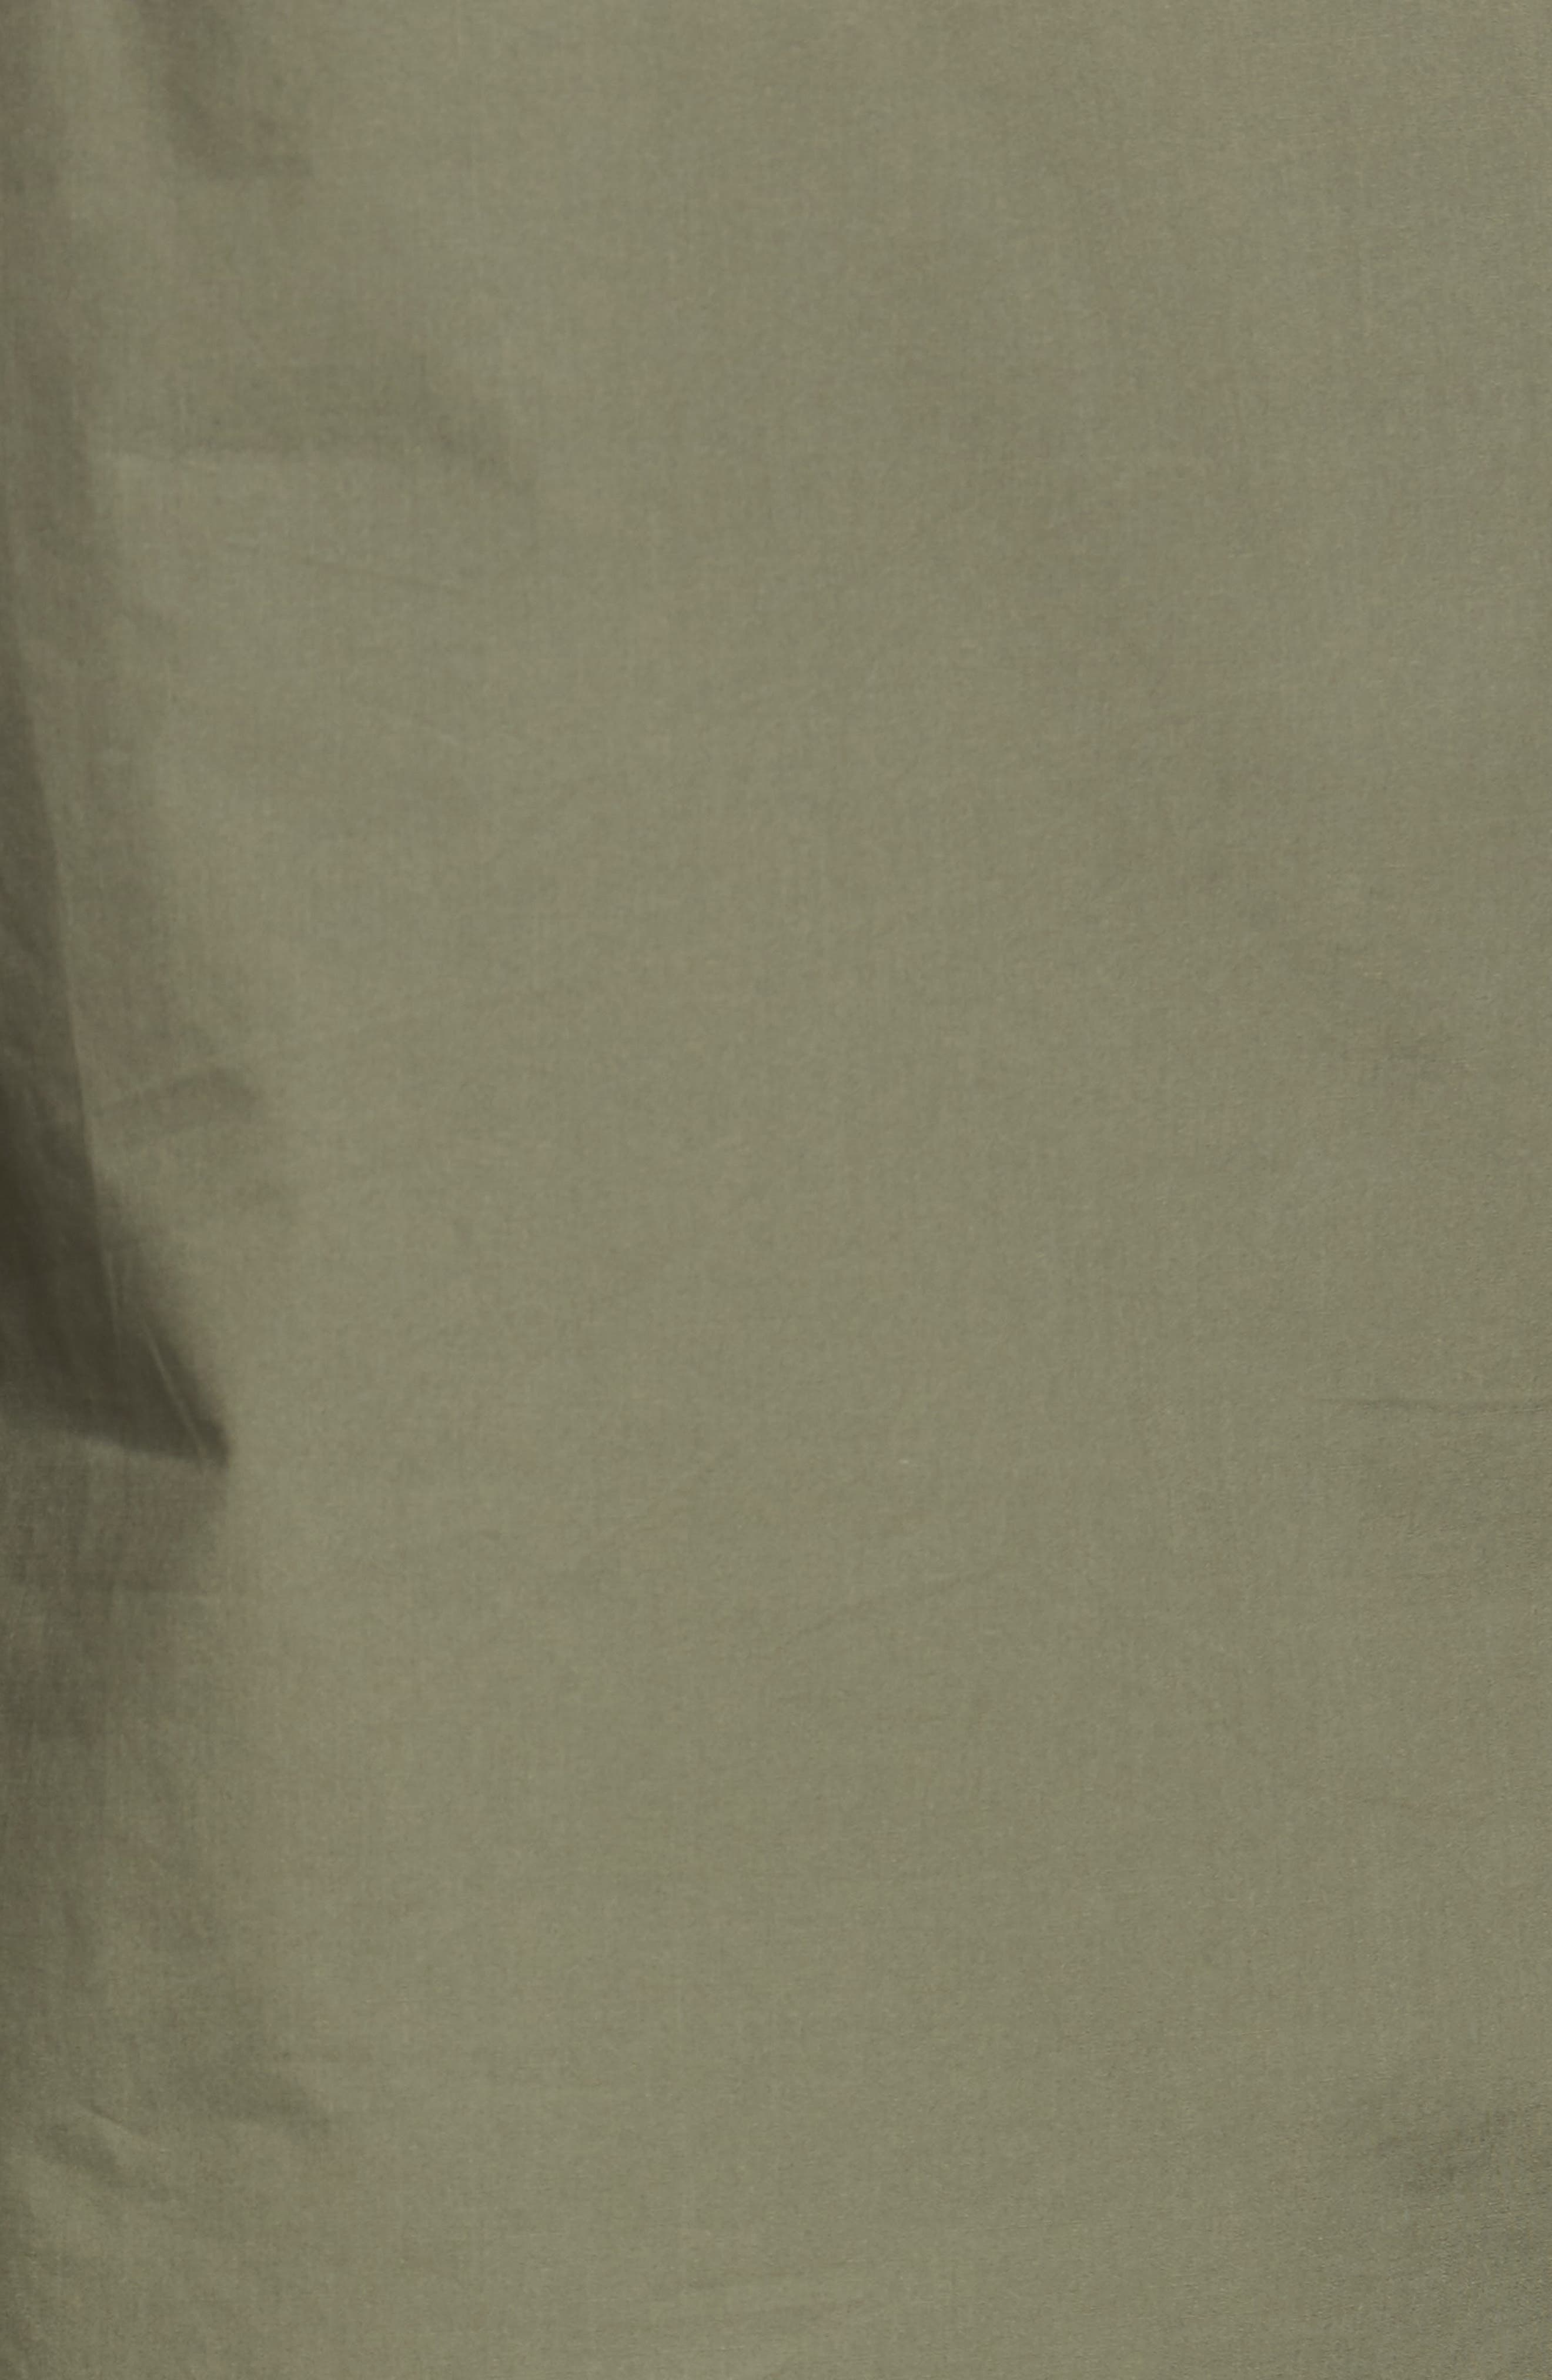 Tie Cuff Poplin Top,                             Alternate thumbnail 5, color,                             307